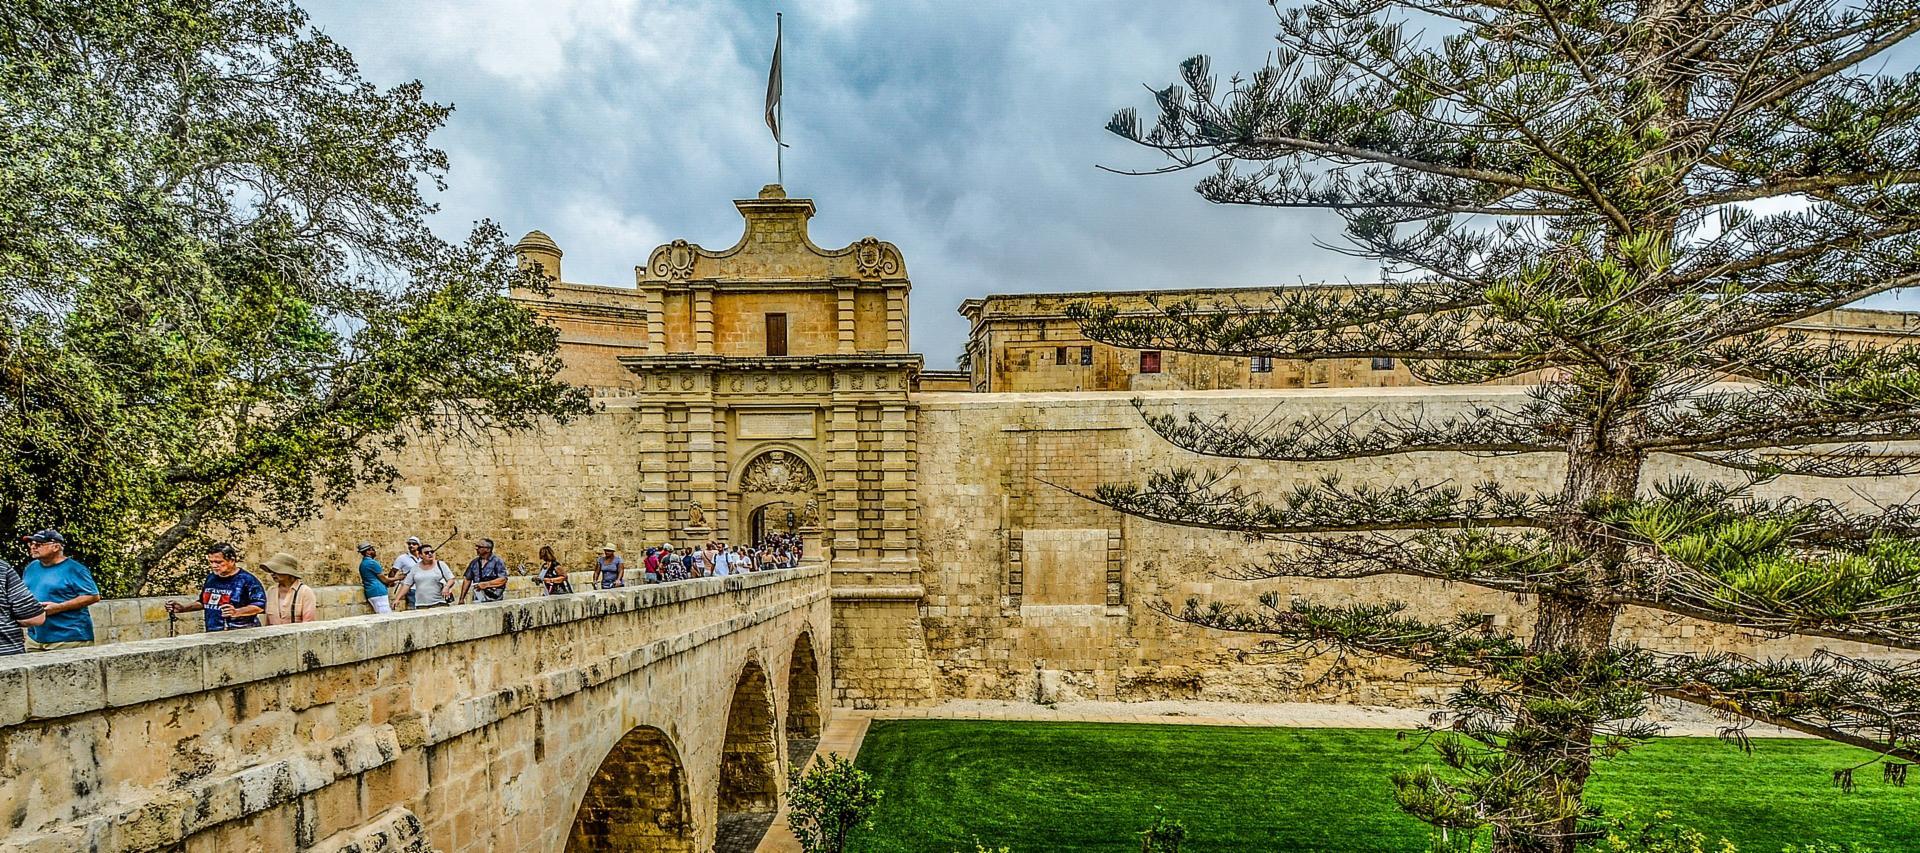 The city gates into Mdina, Malta.